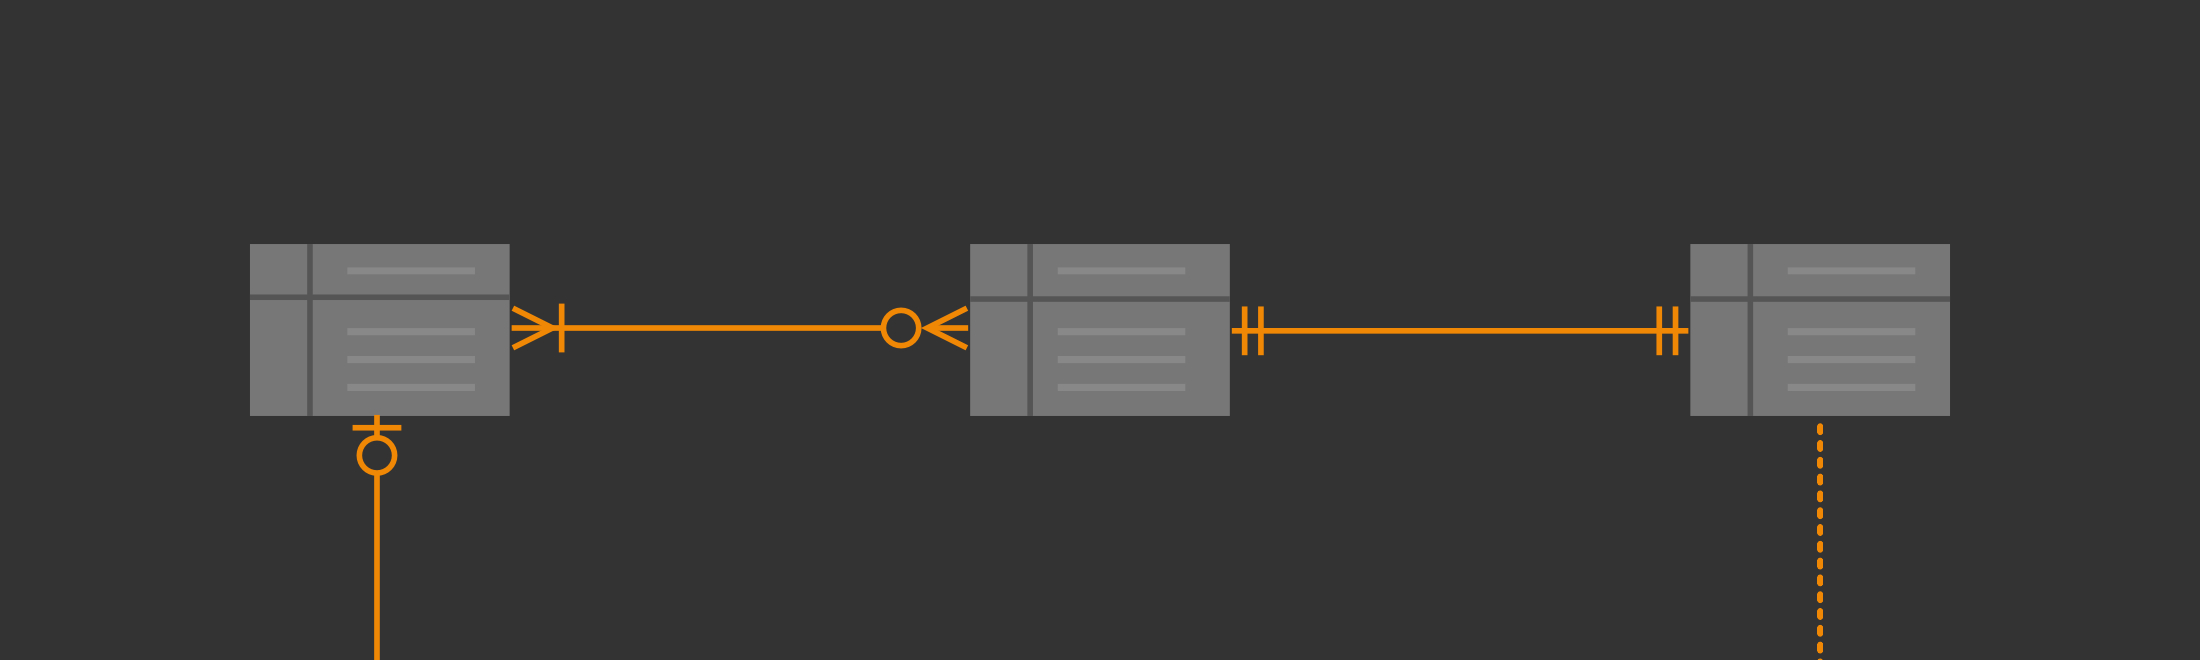 Entity Relationship Diagrams With Draw.io – Draw.io within Er Diagram N-M Relationship